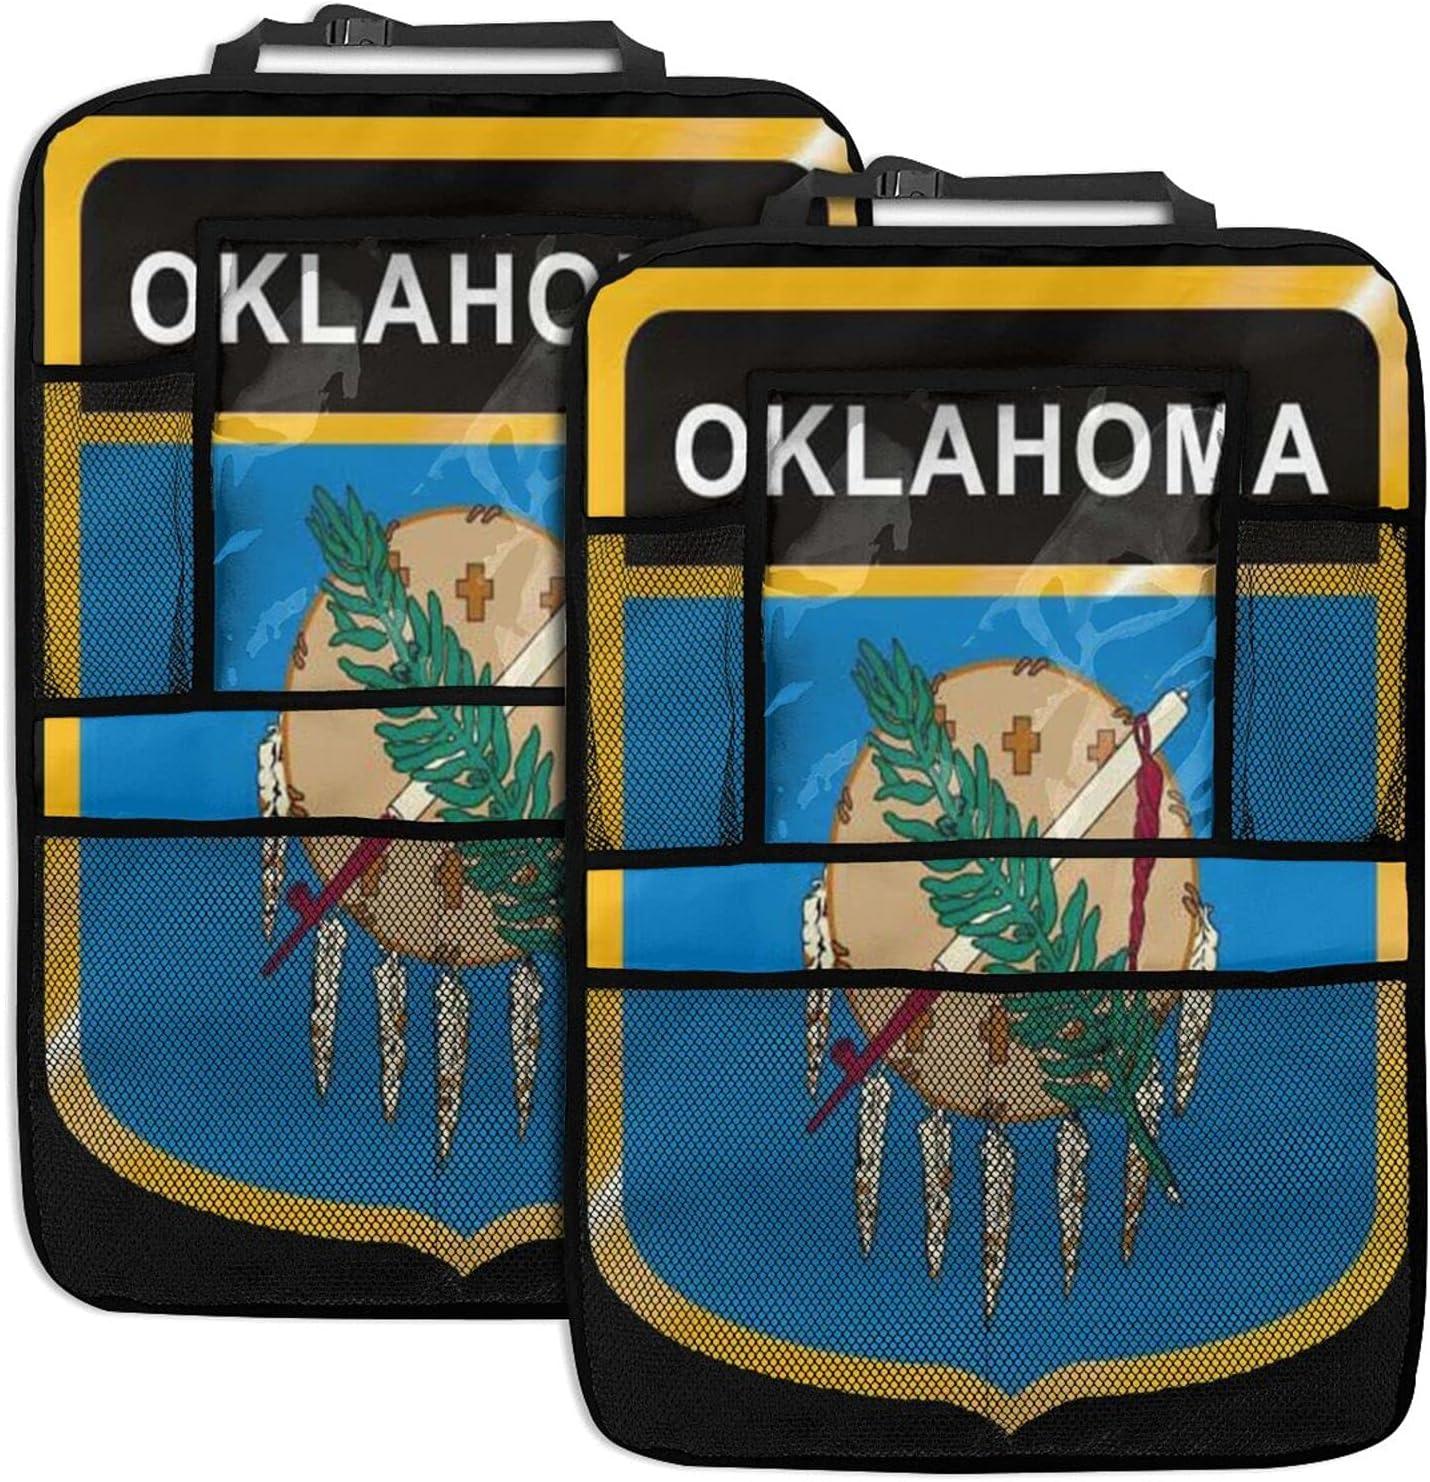 Oklahoma Brand Cheap Sale Venue Flag latest Crest Durable Car Back Organizer Muti-Pocket Seat